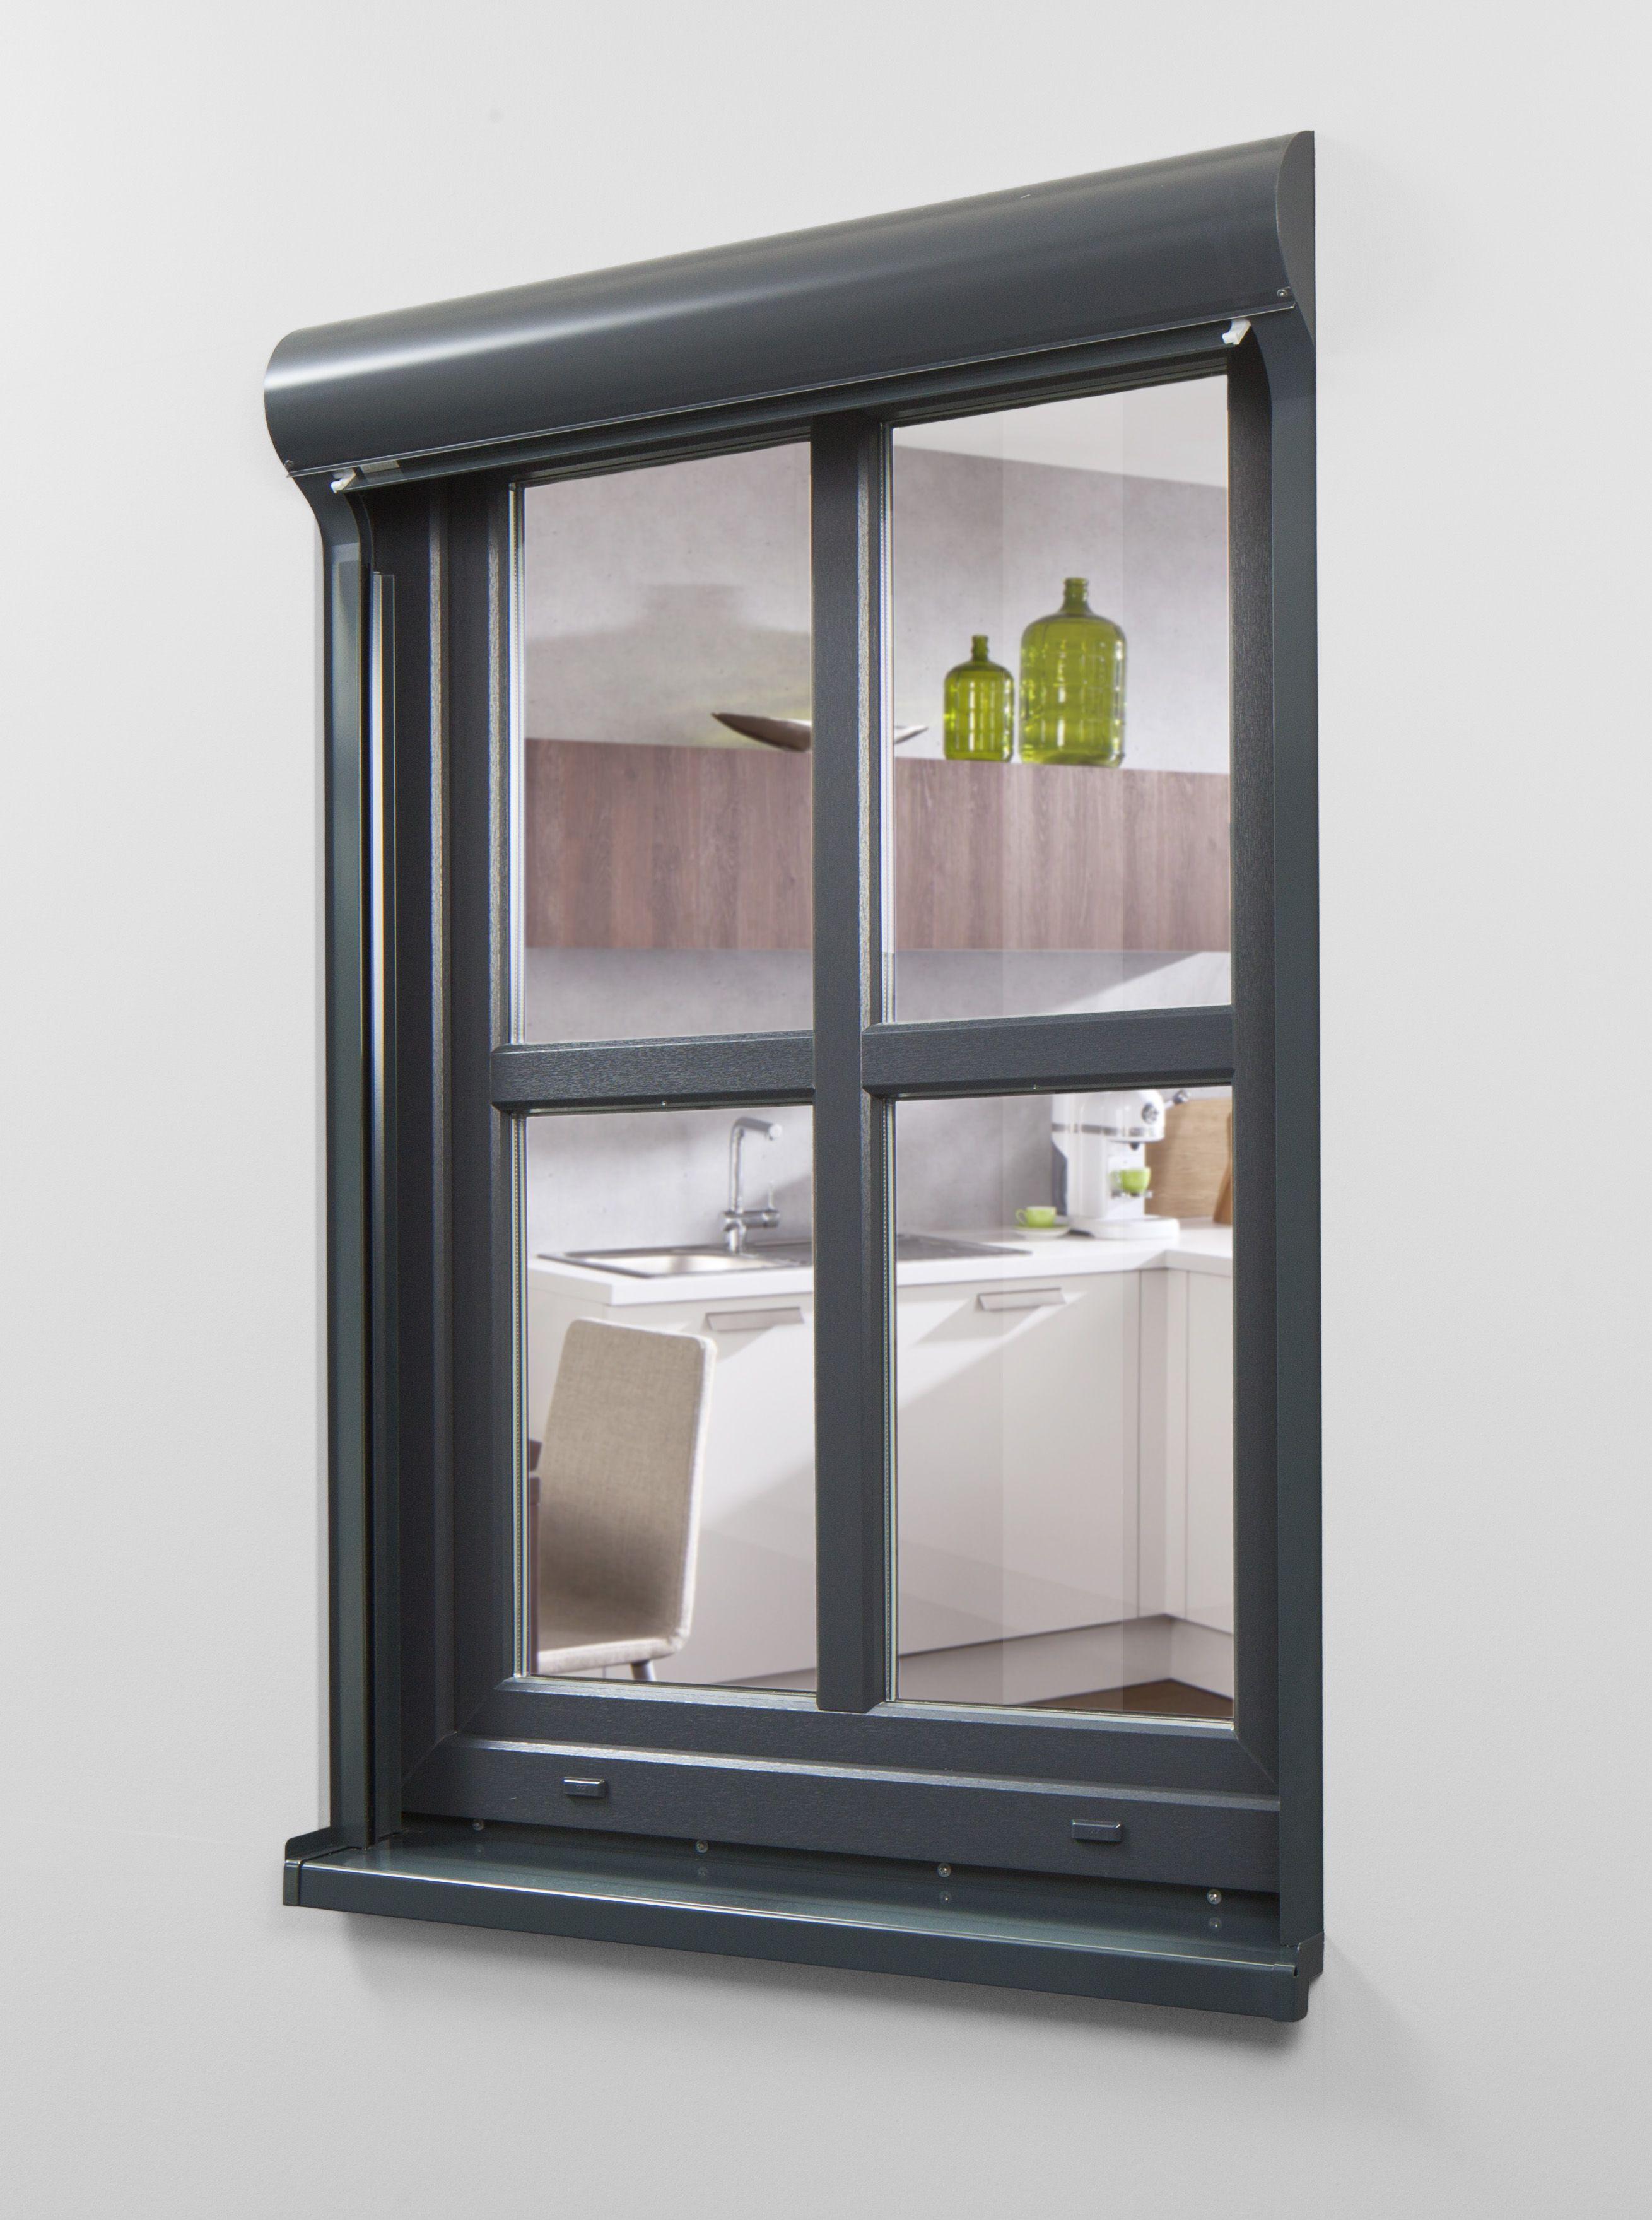 rollladen rolladen icnib. Black Bedroom Furniture Sets. Home Design Ideas